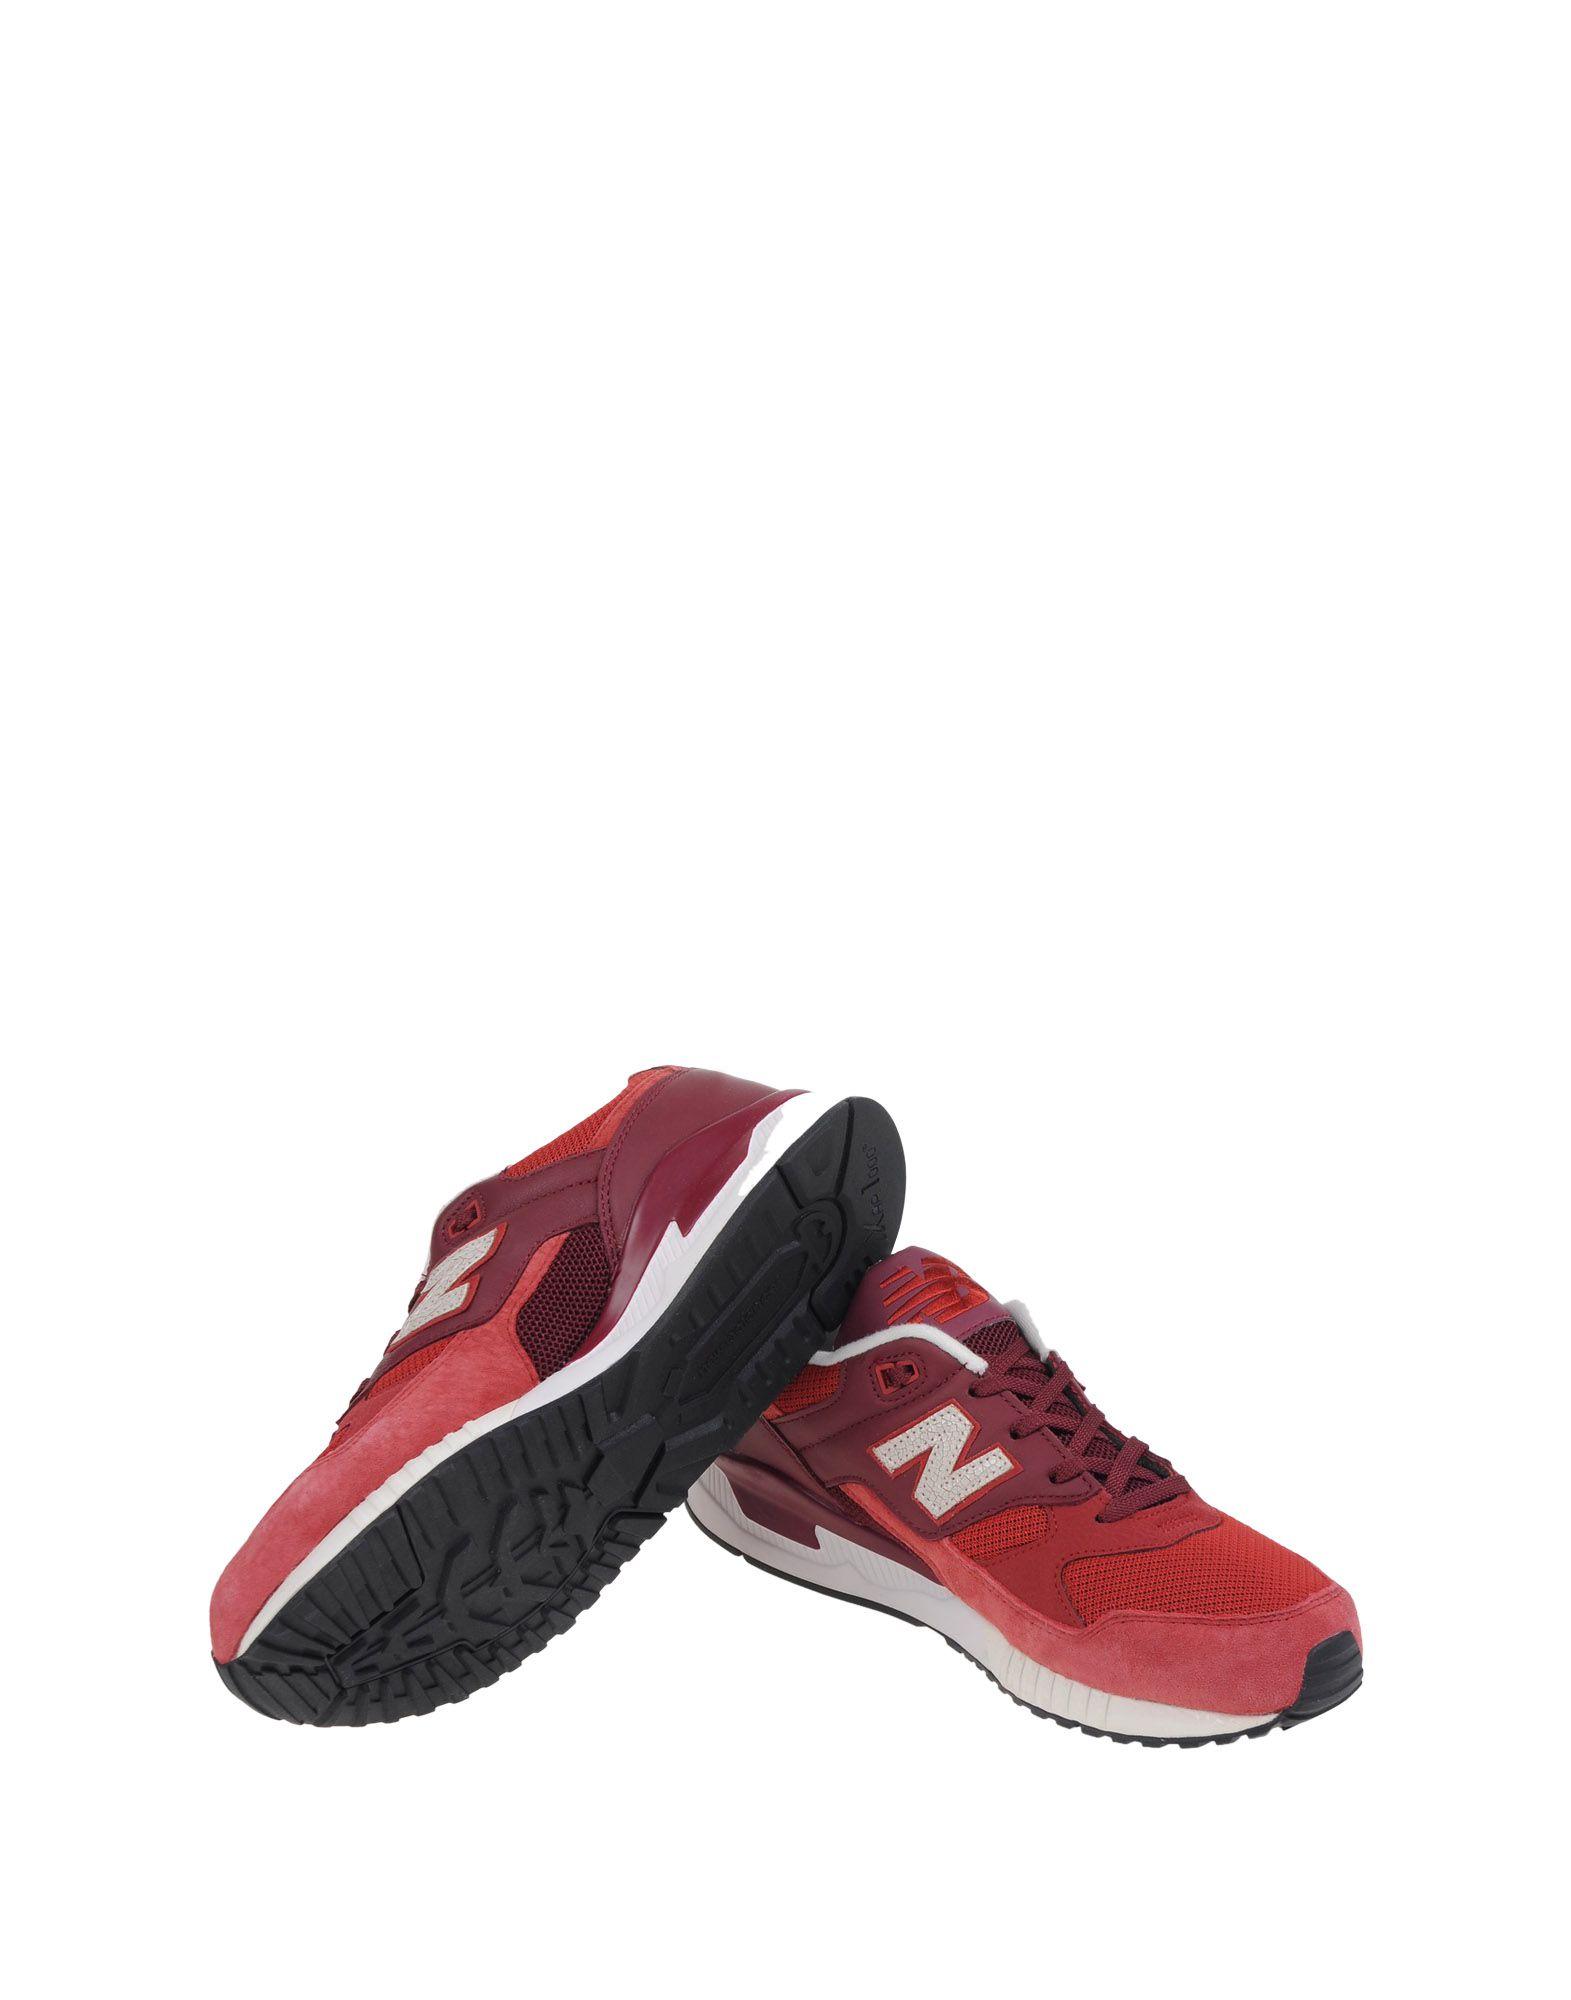 Rabatt 530 echte Schuhe New Balance 530 Rabatt Oxidized  11105810PV 62f7dd